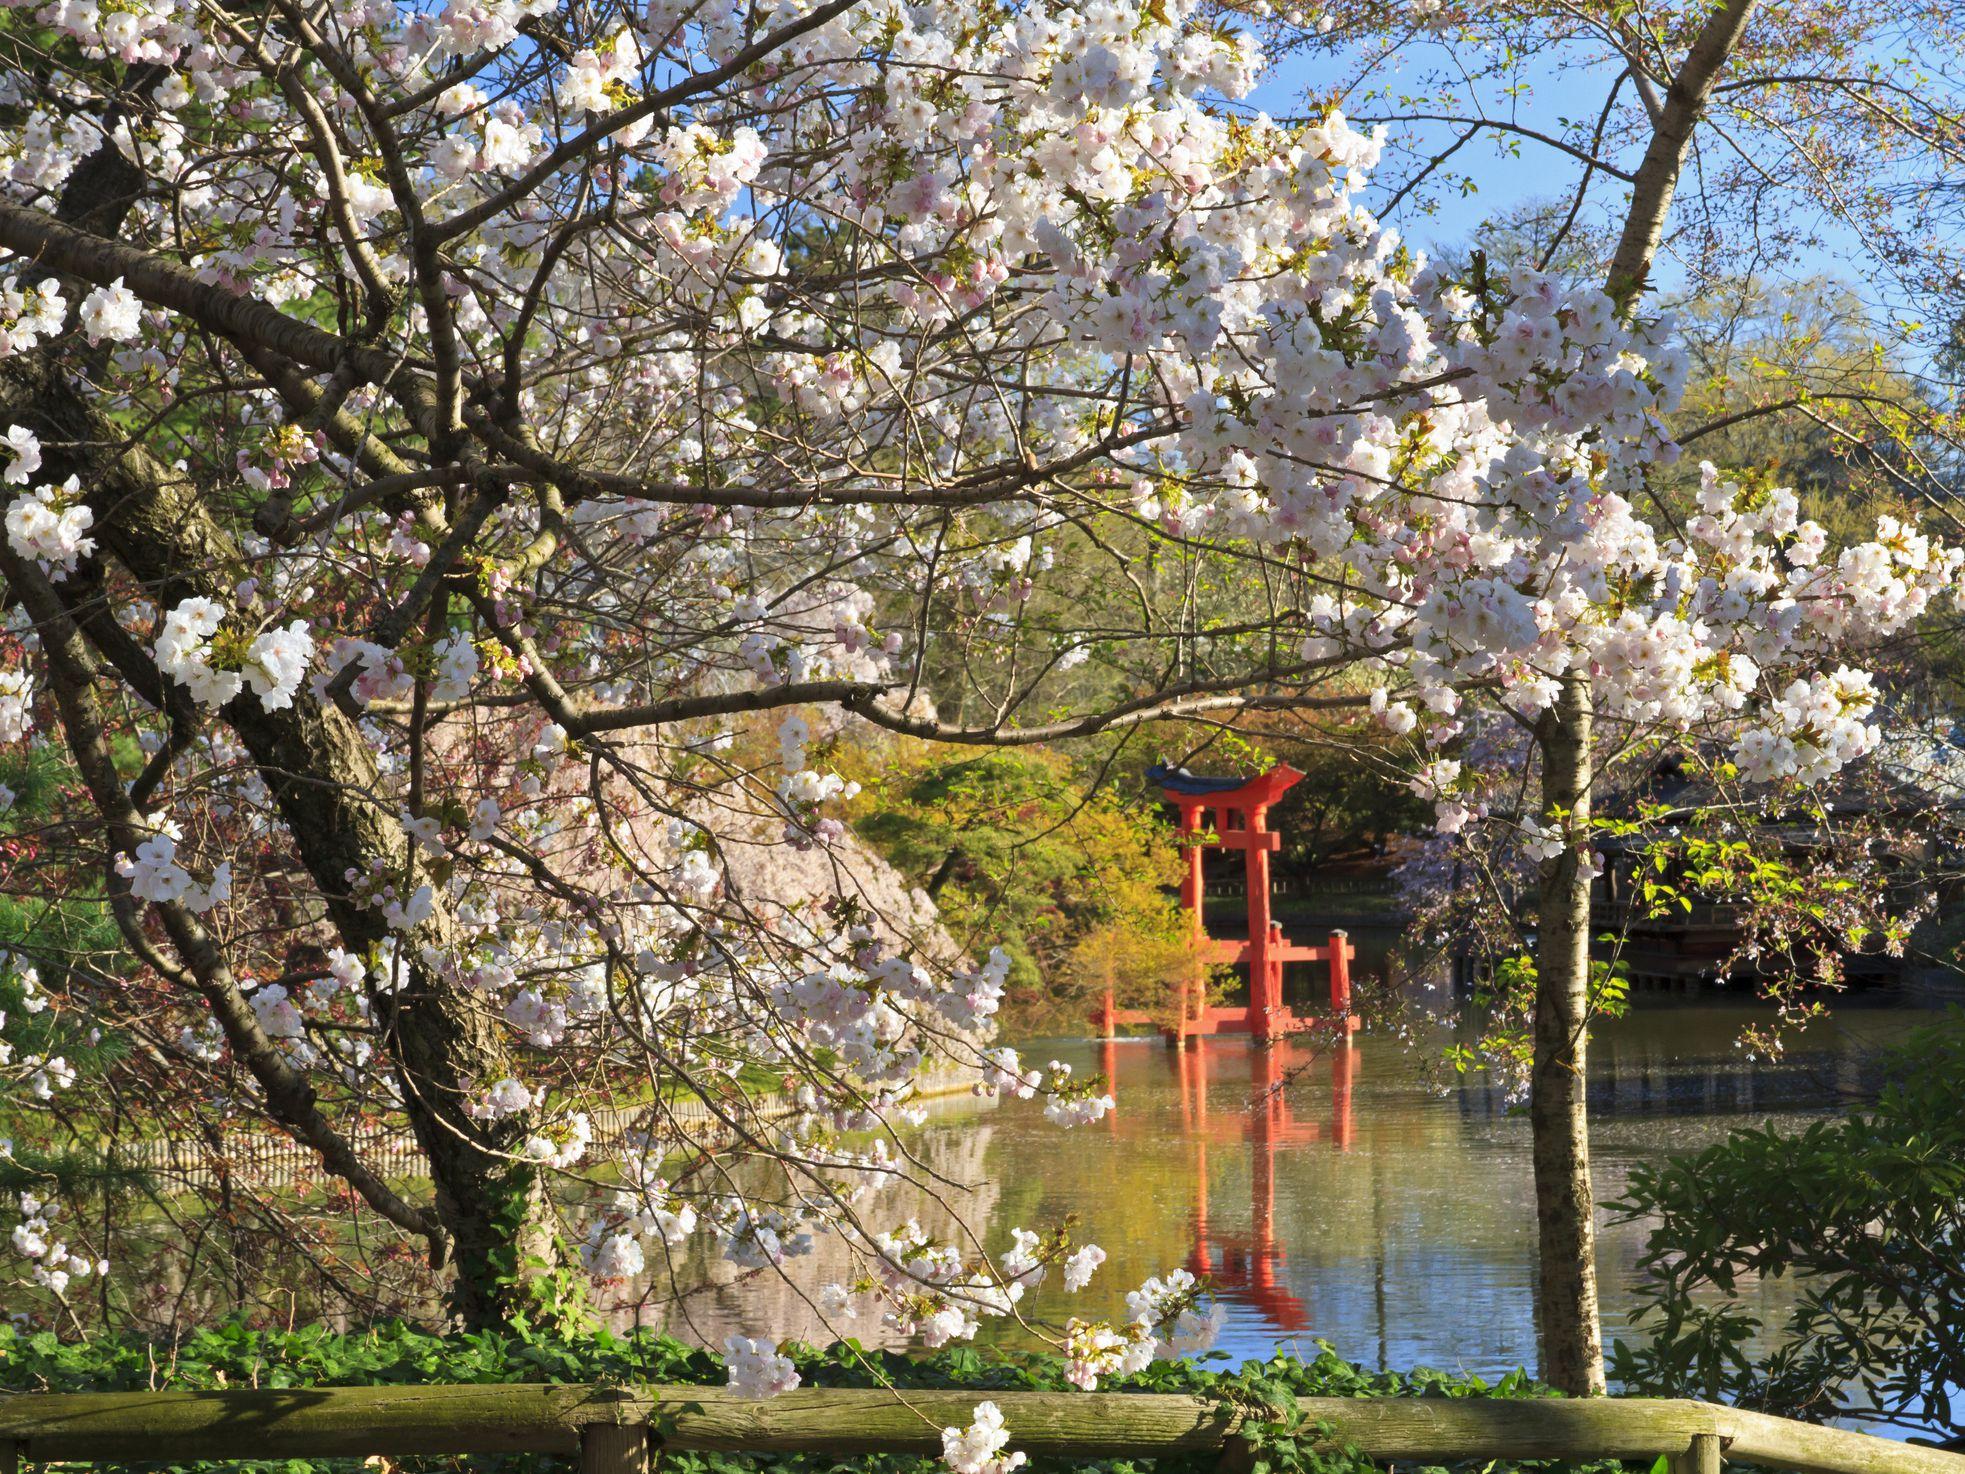 Brooklyn Botanic Garden Visitors Guide